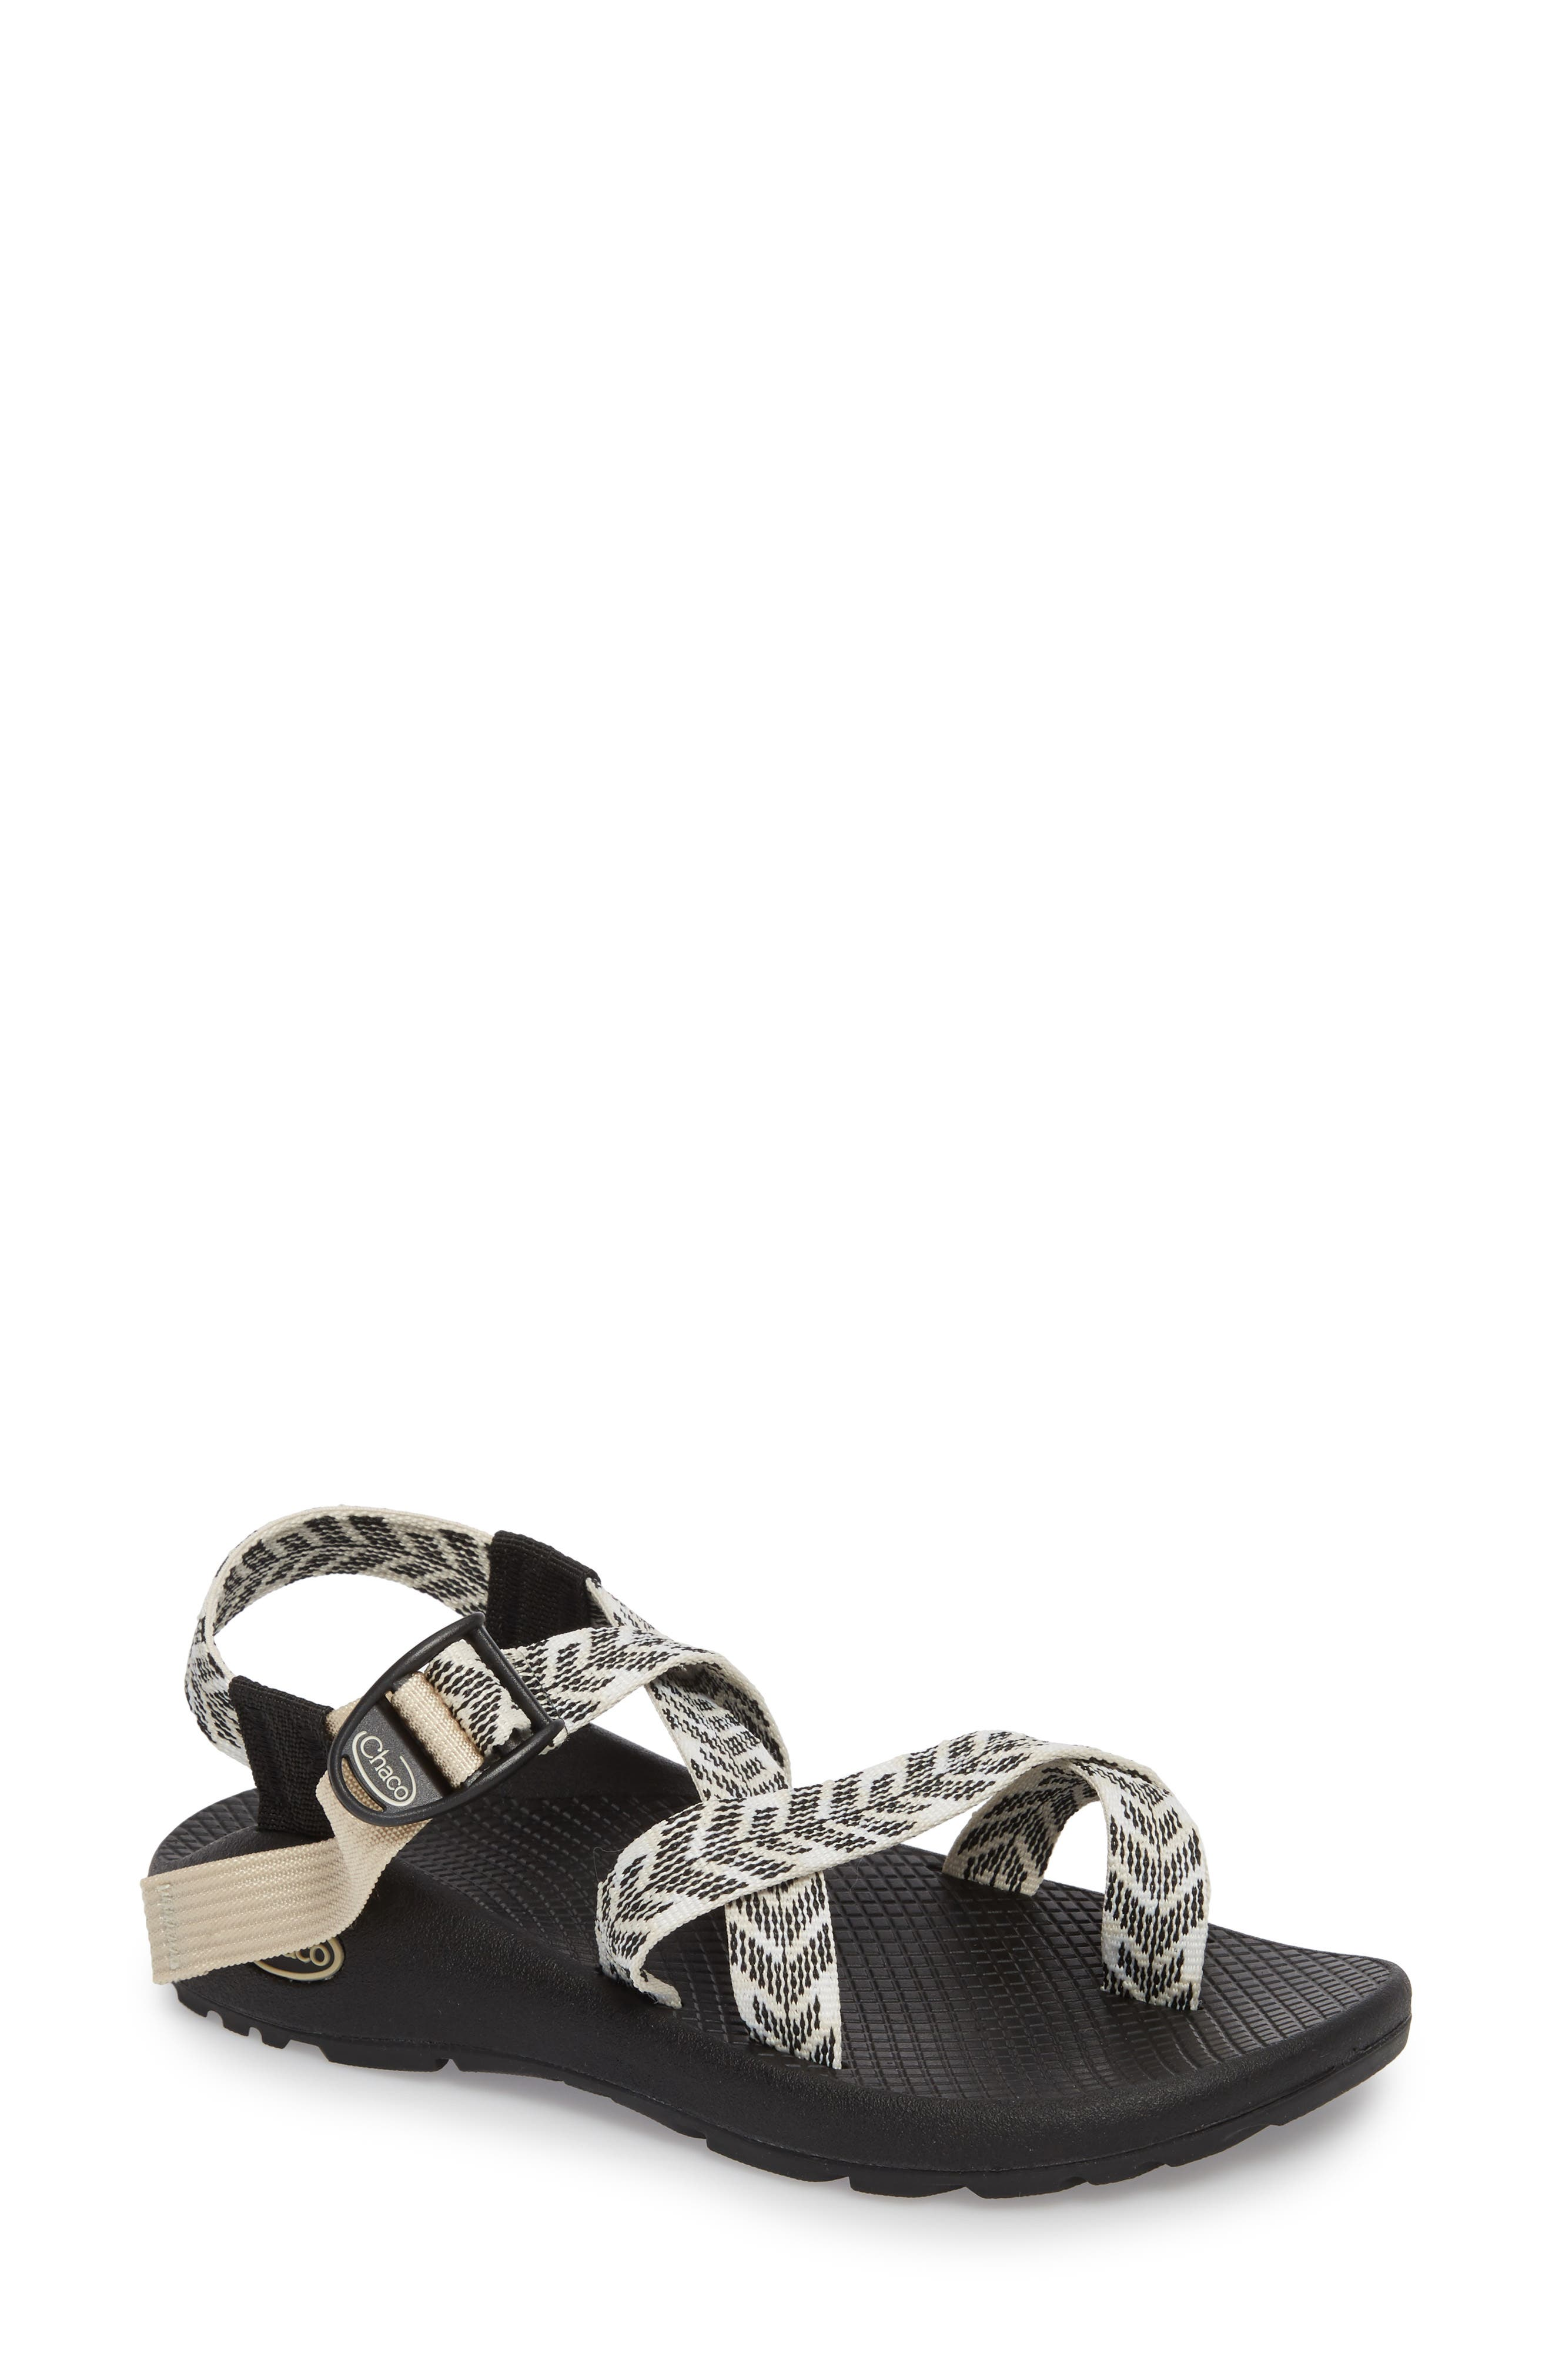 Z/2 Classic Sport Sandal,                         Main,                         color, TRINE BLACK / WHITE